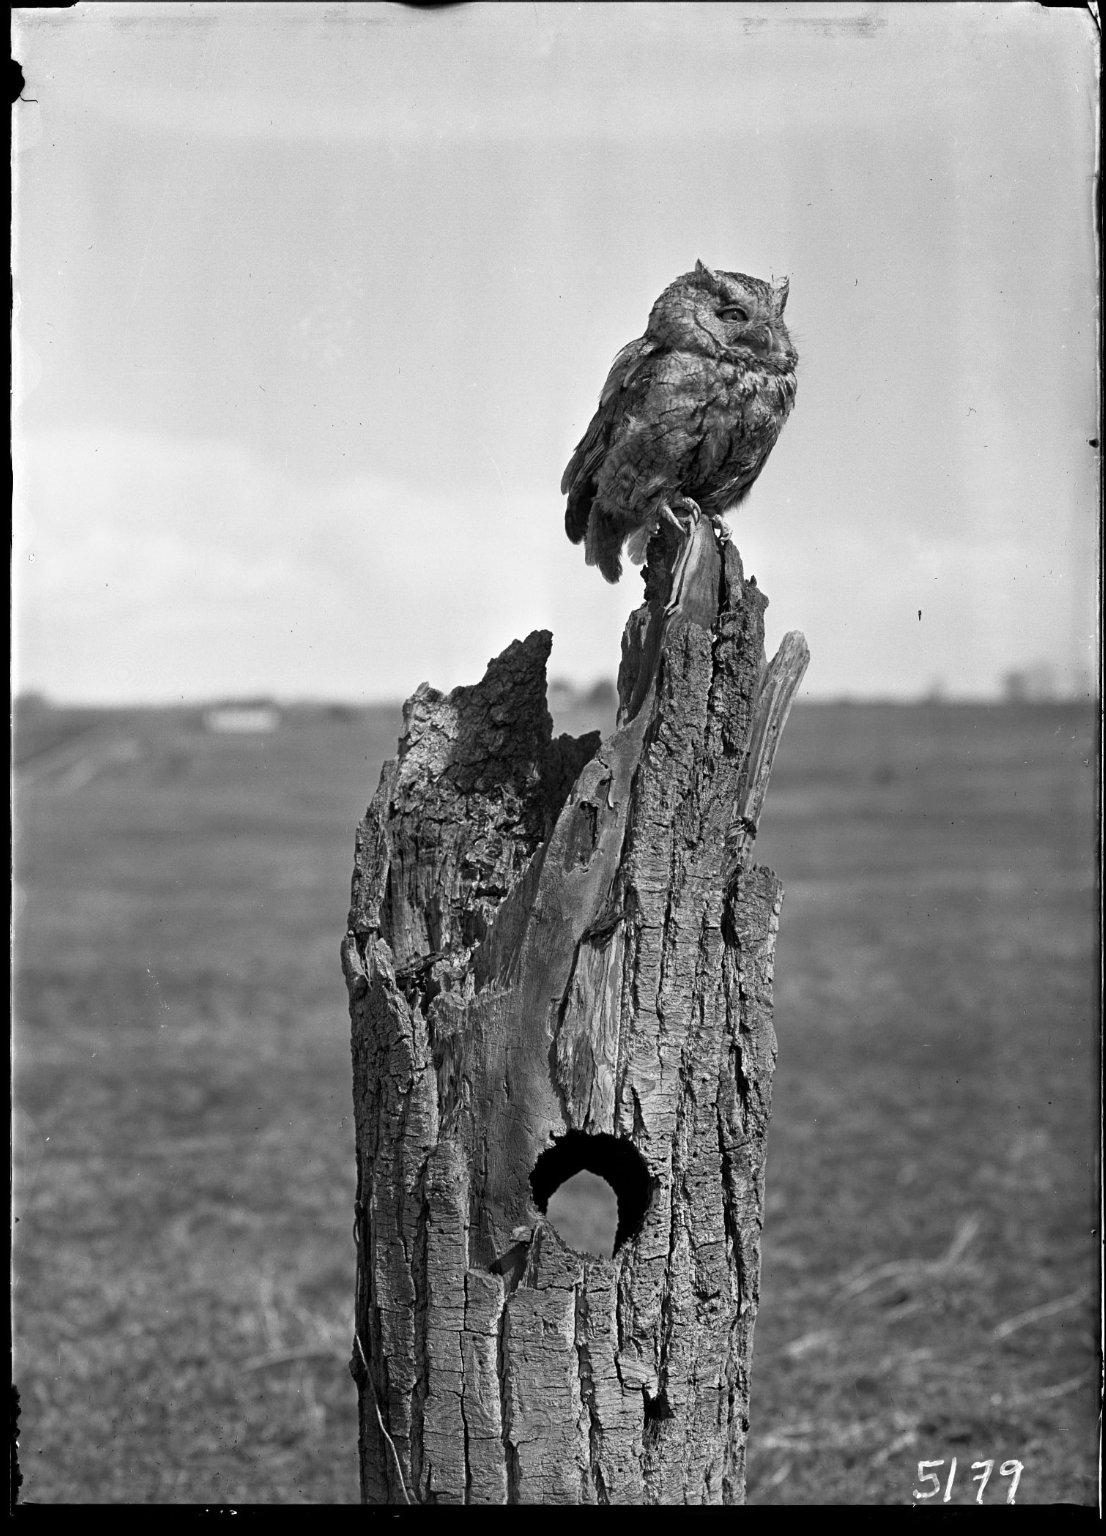 Screech owl on stump